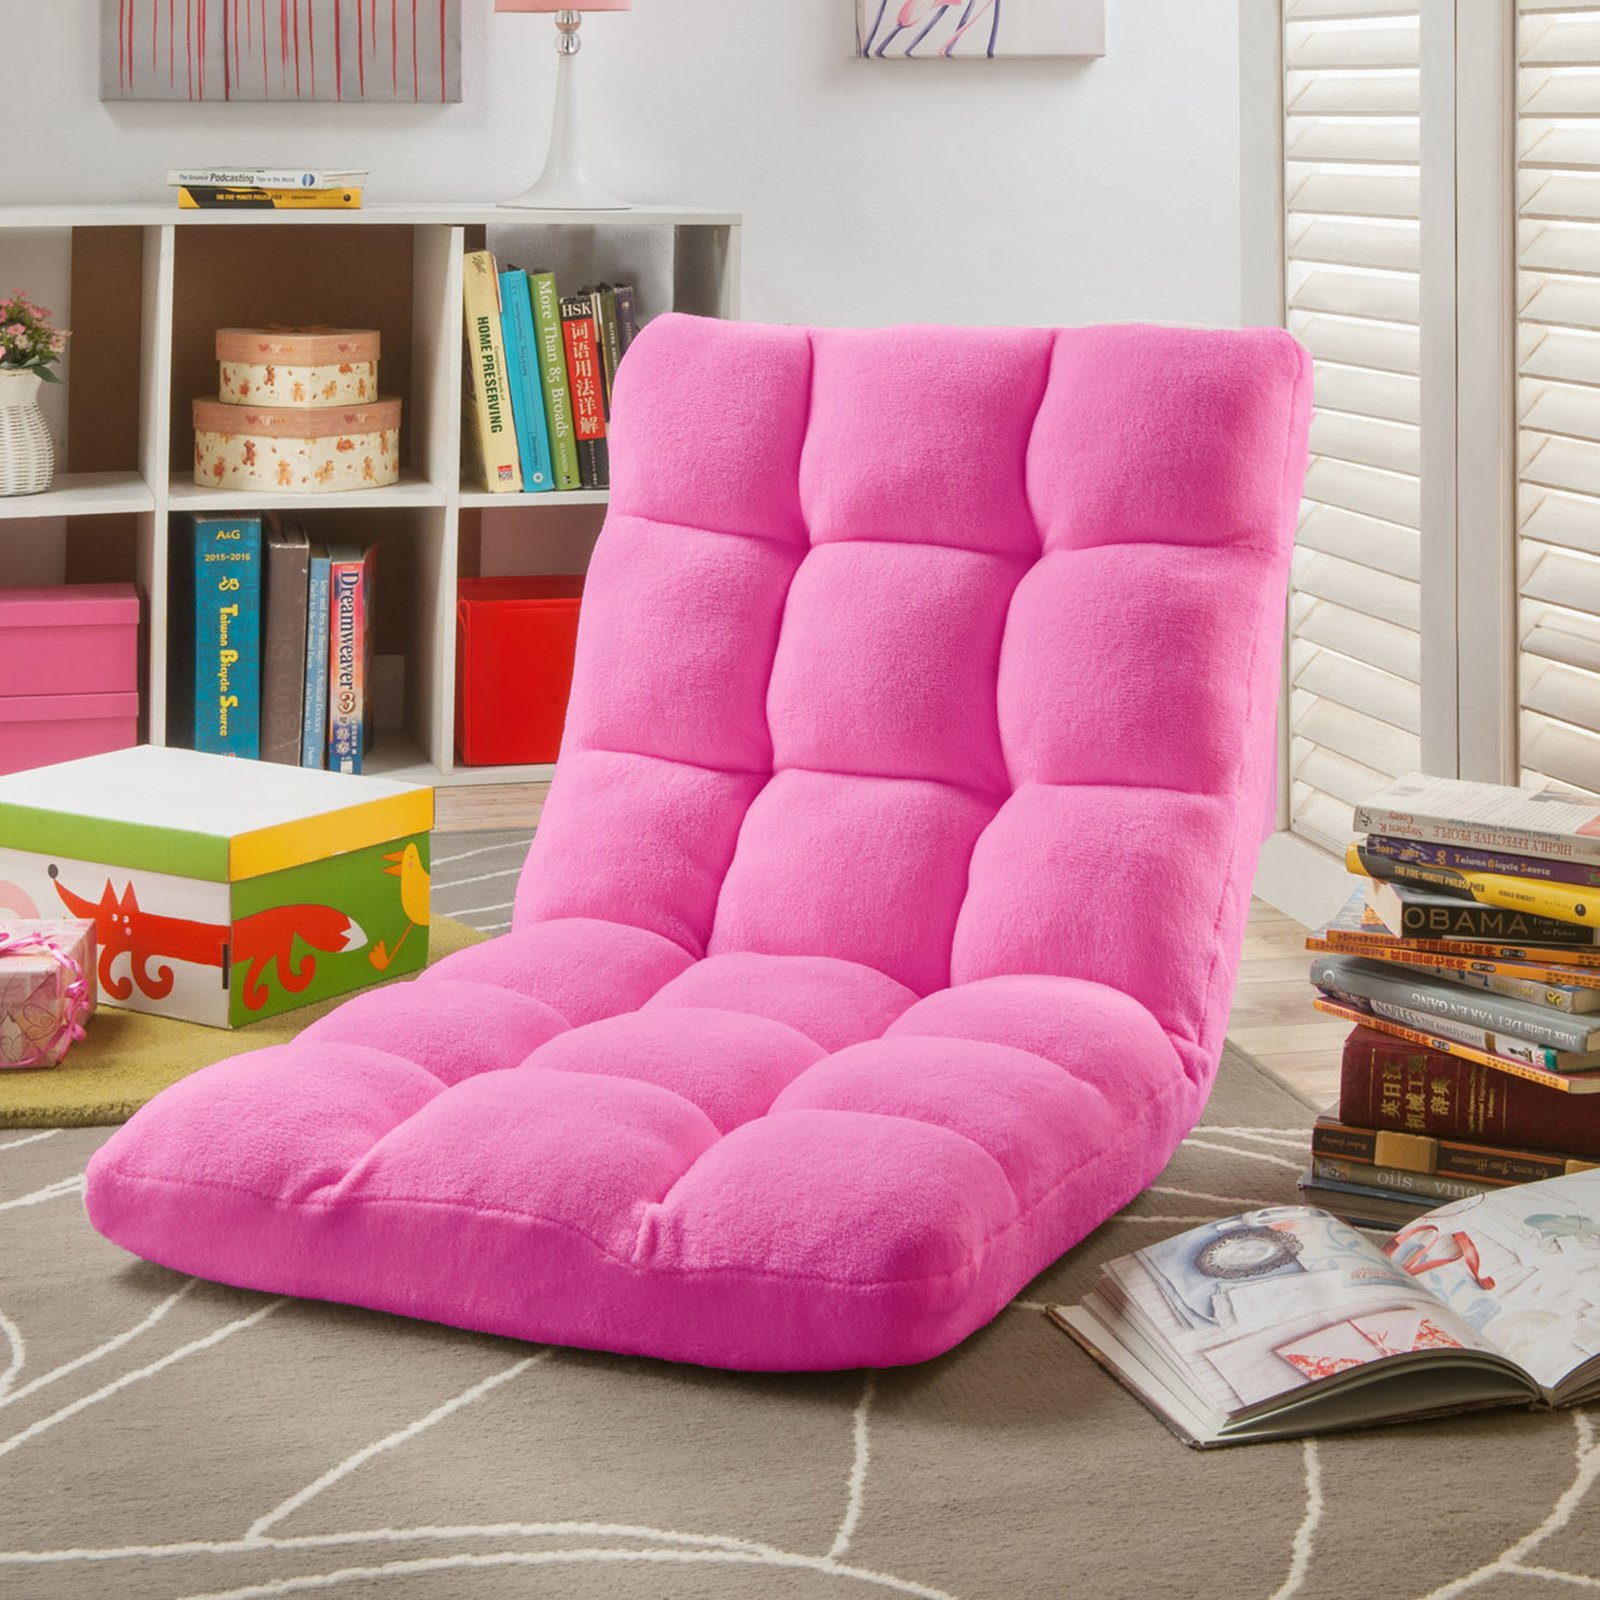 Loungie Microplush Modern Convertible Chair